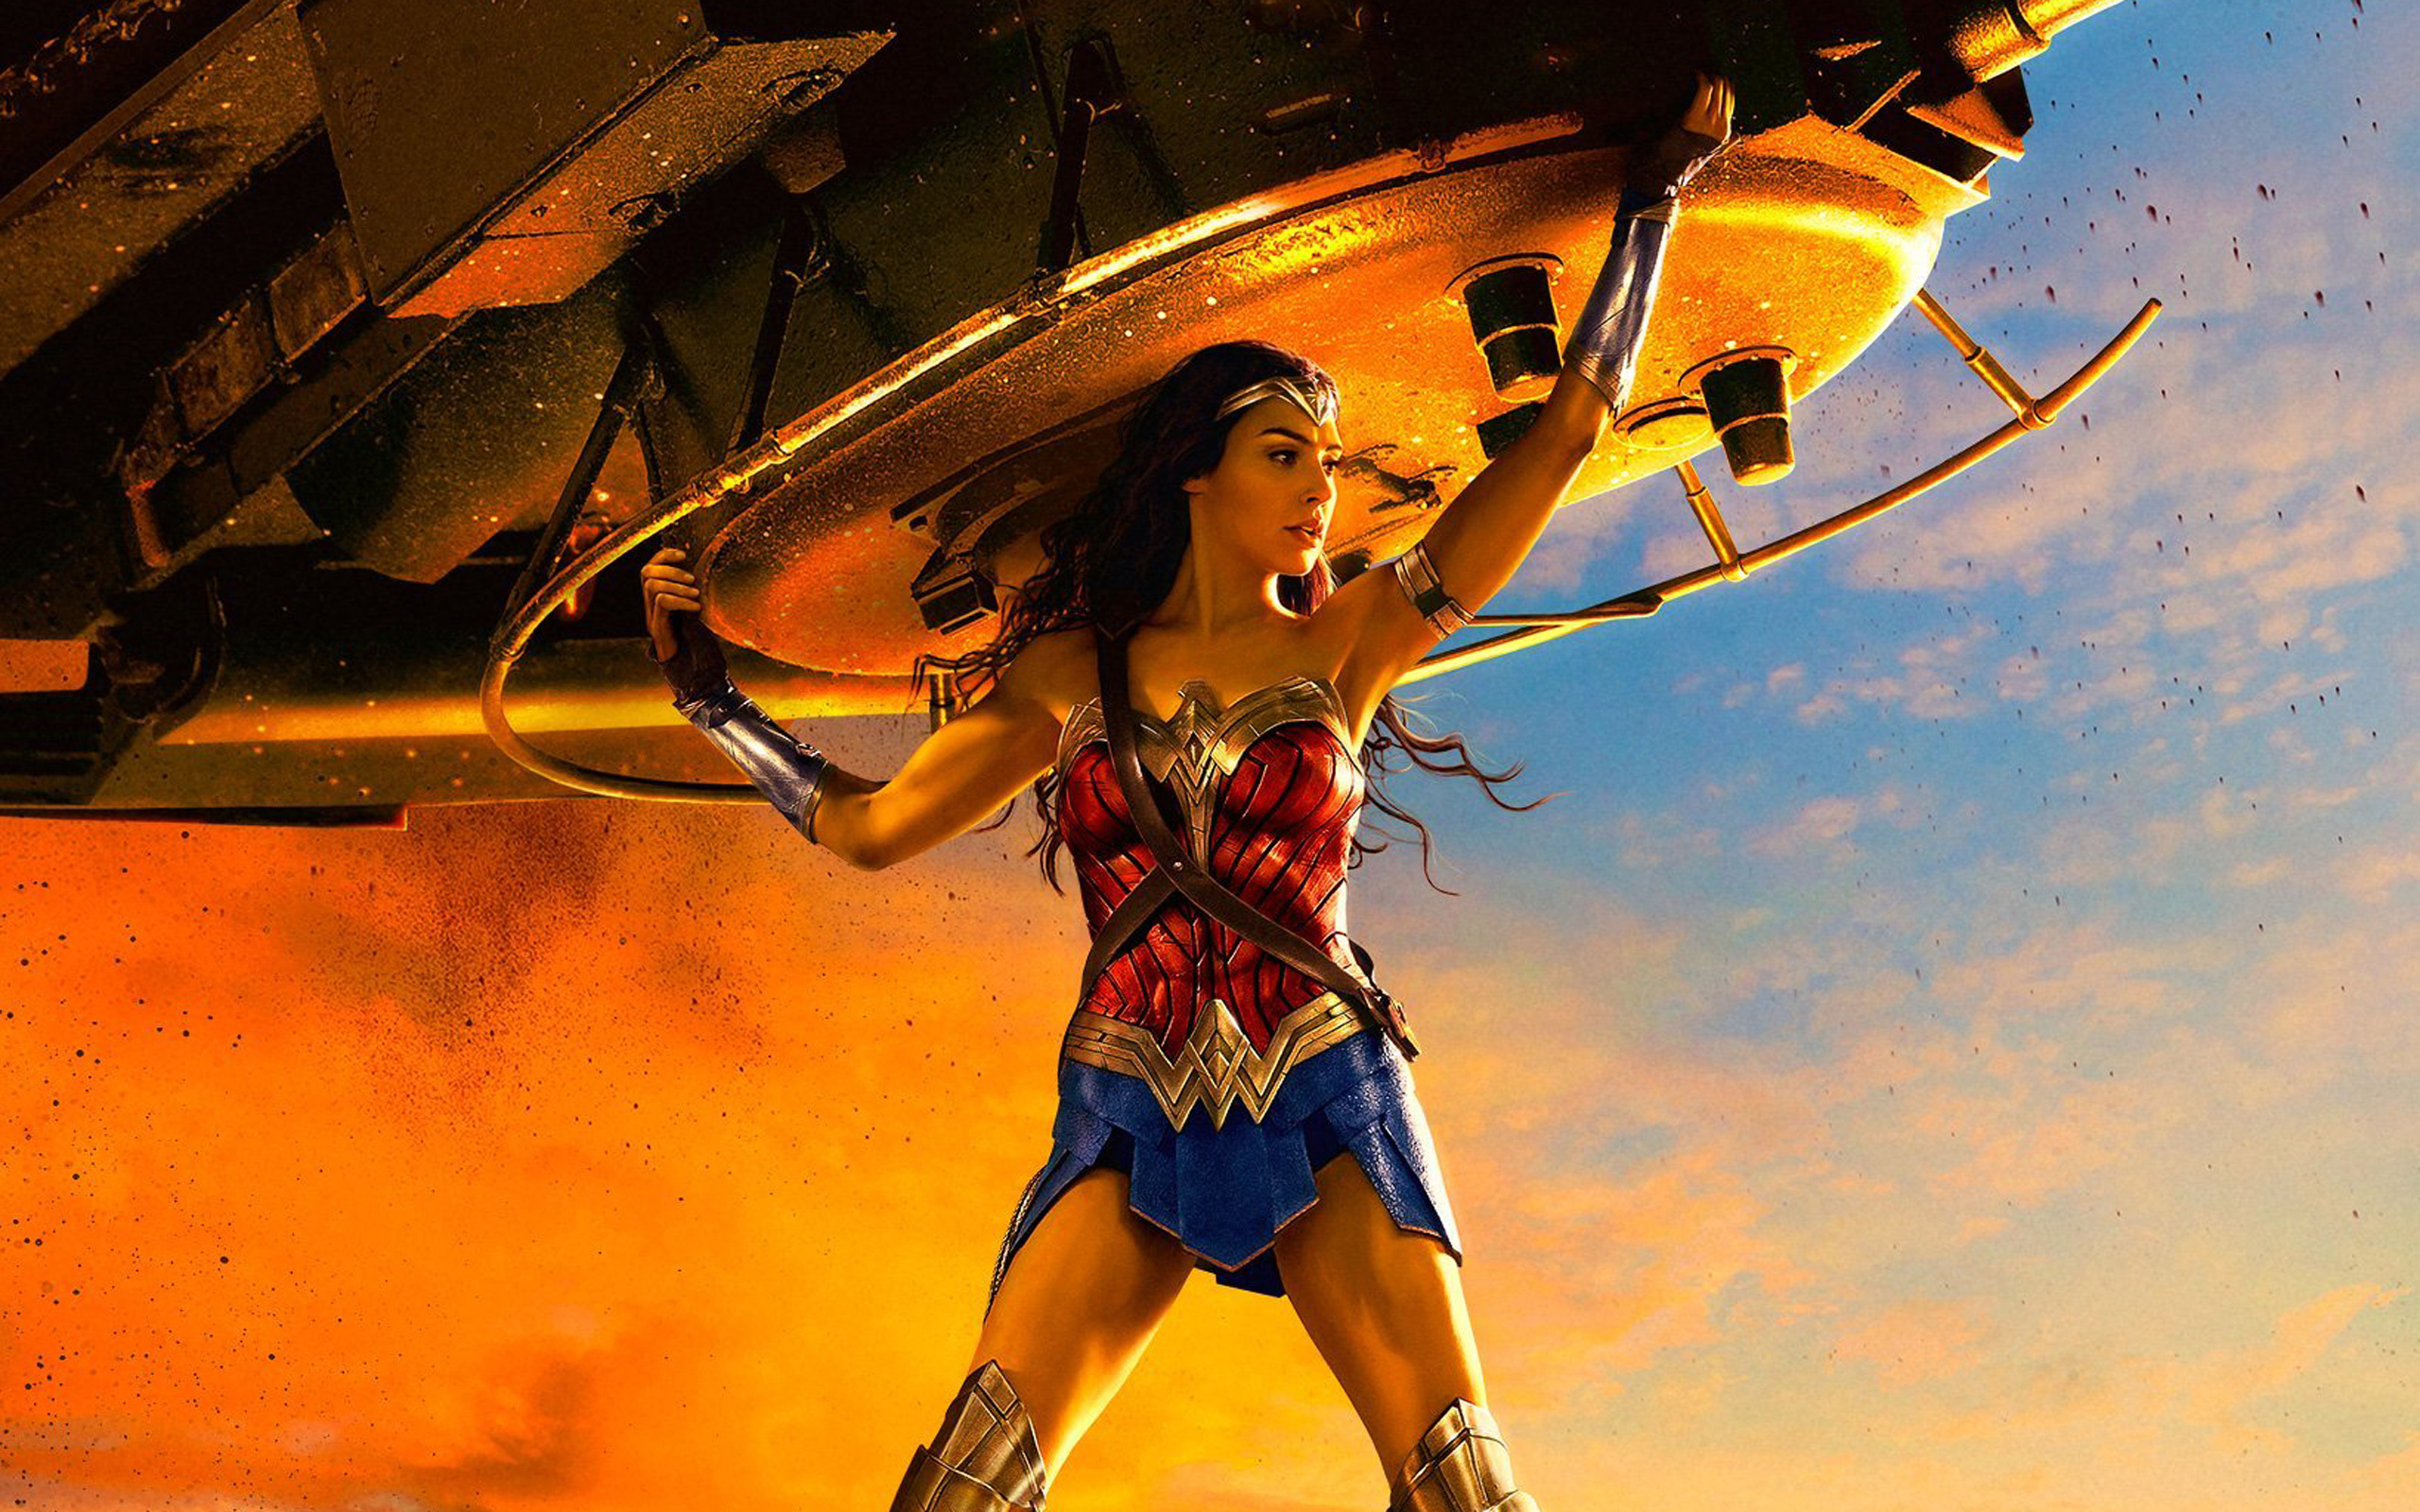 Wonder Woman Movie Wallpaper 1: Wonder Woman Lifting Tank, HD Movies, 4k Wallpapers